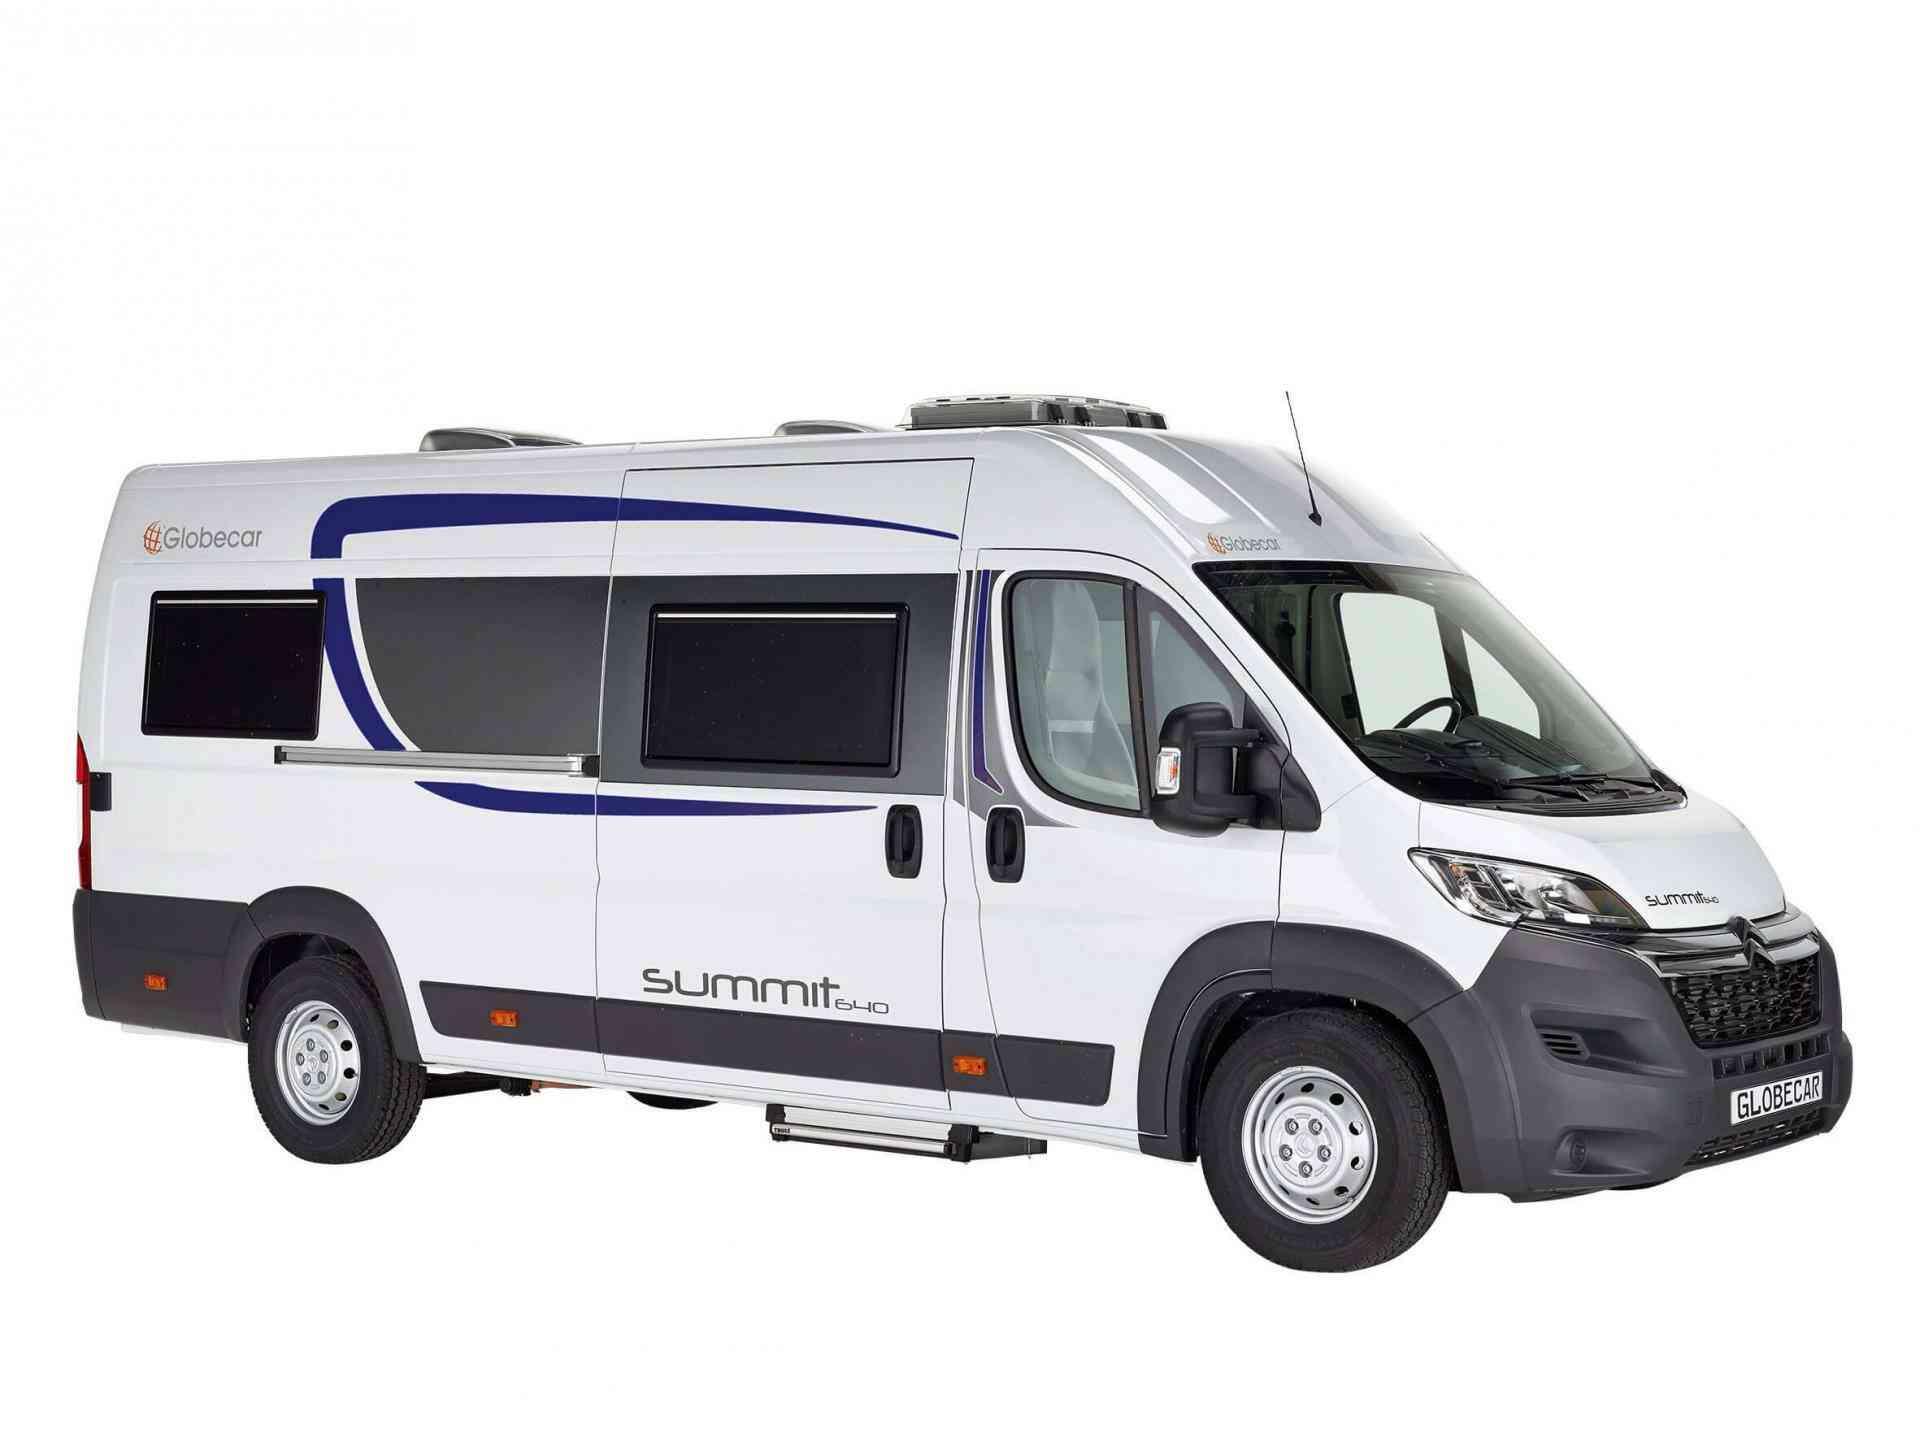 camping-car GLOBECAR SUMMIT 640